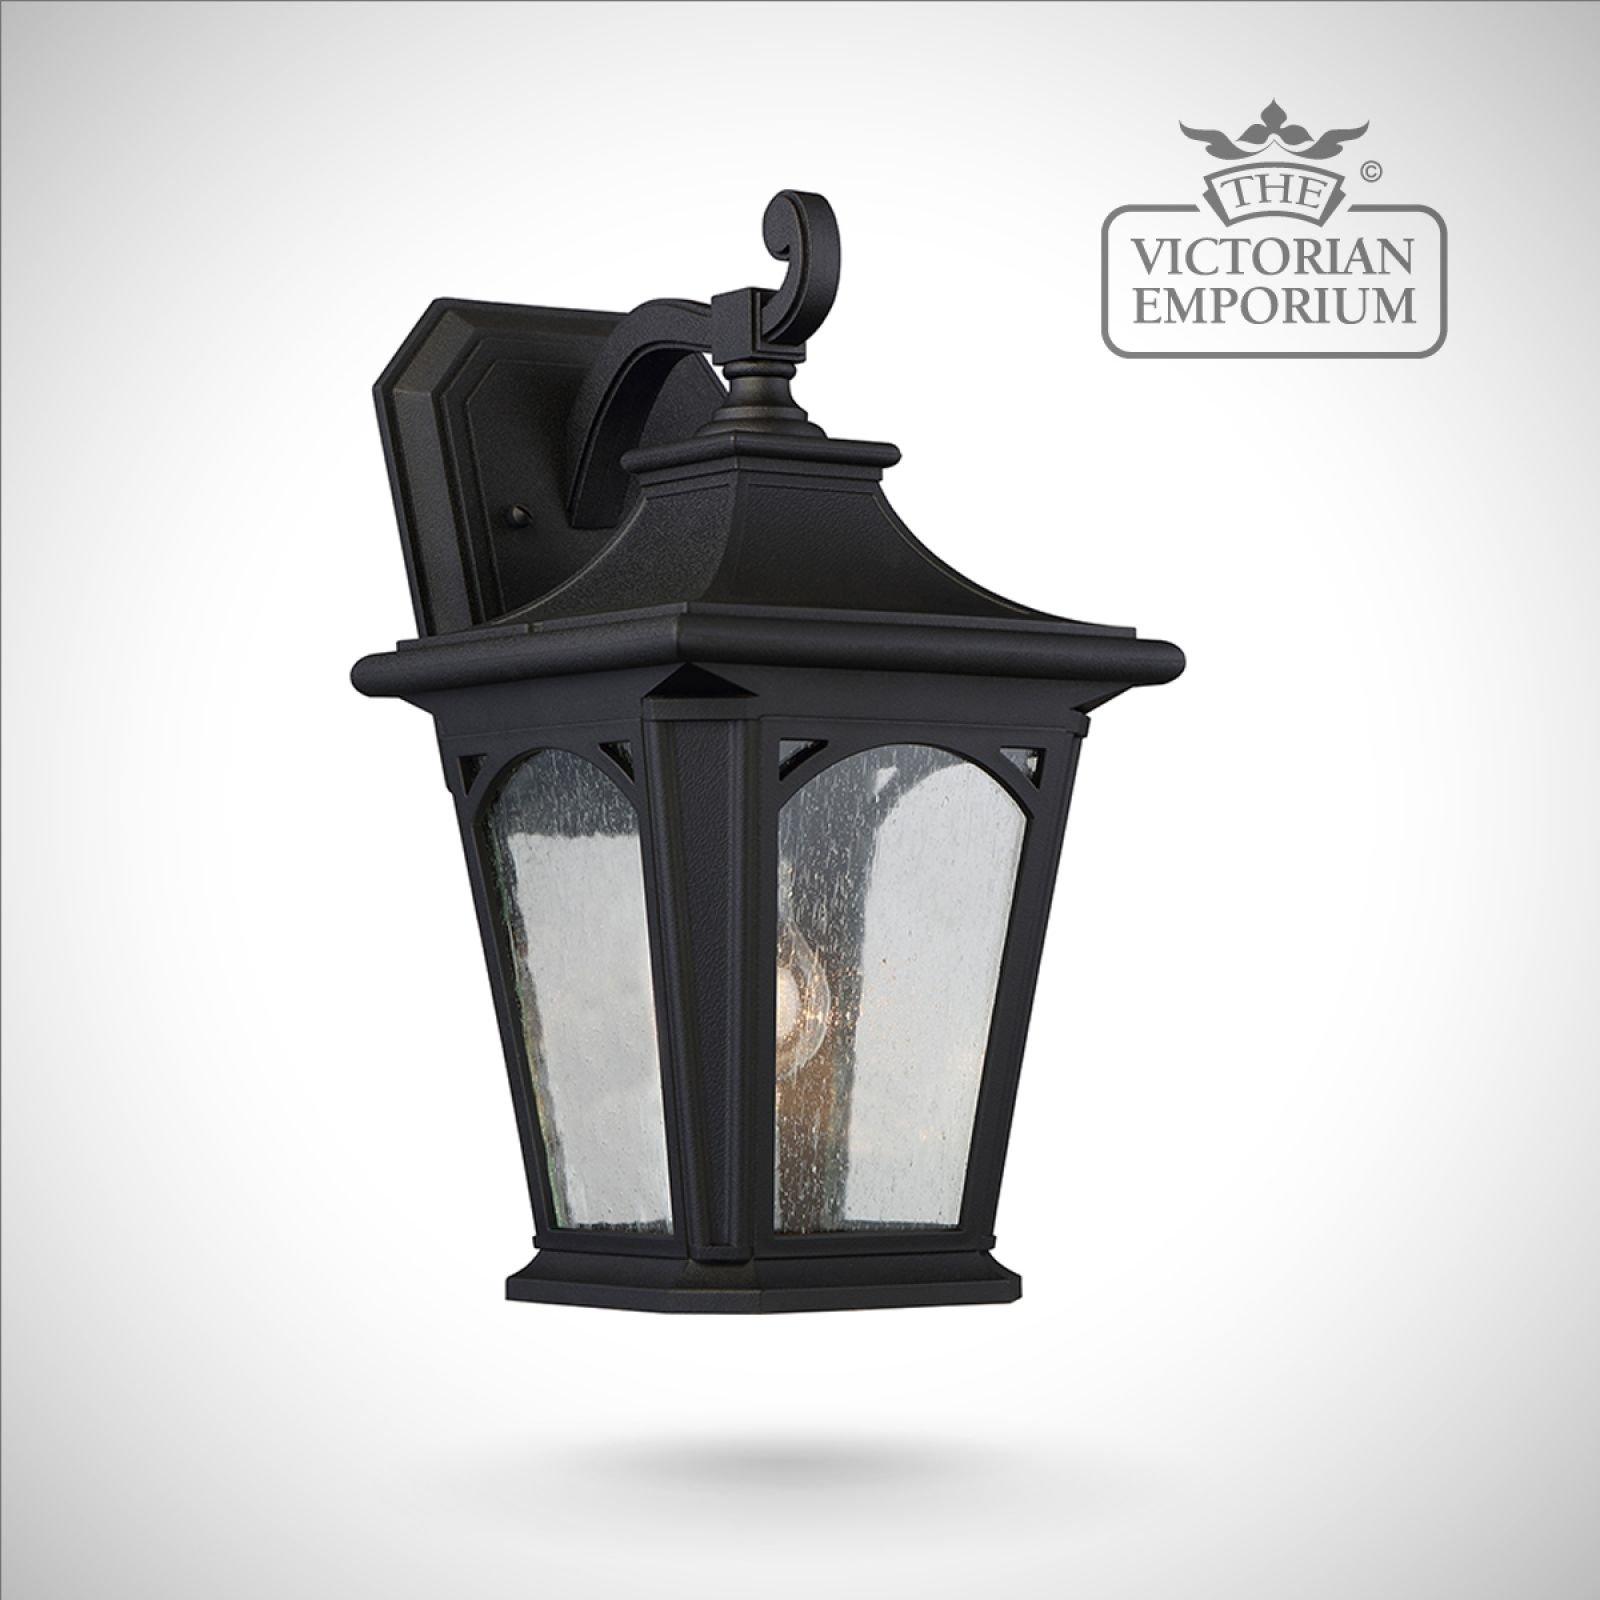 Bedfords Medium Pedestal Lantern In Black: Bedfords Medium Wall Lantern In Black